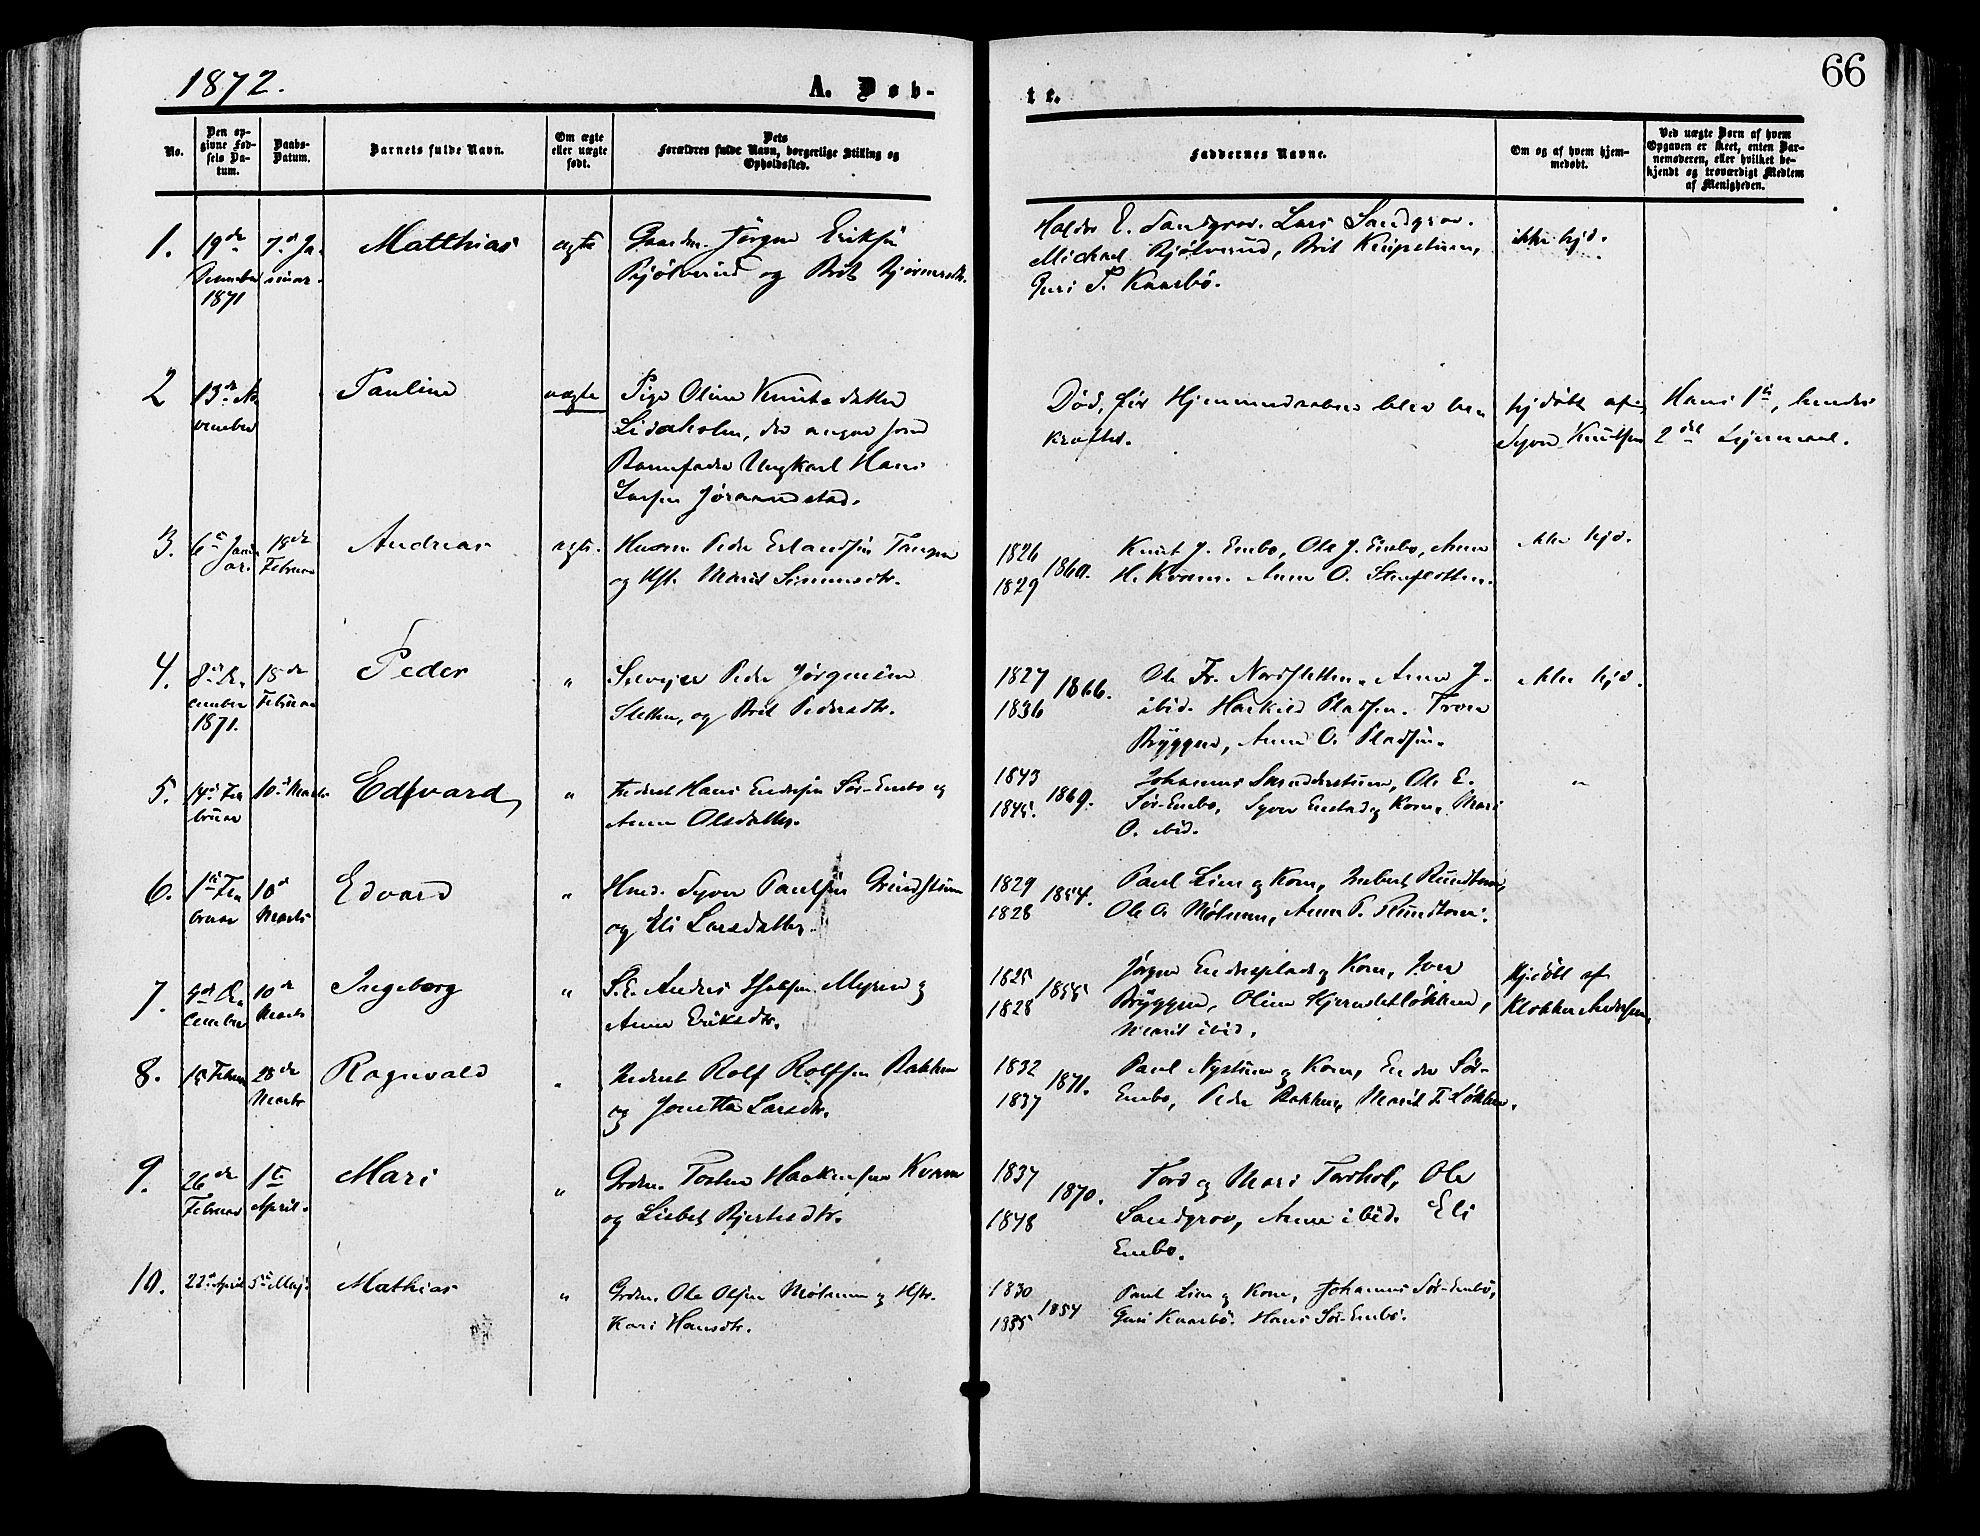 SAH, Lesja prestekontor, Ministerialbok nr. 9, 1854-1889, s. 66